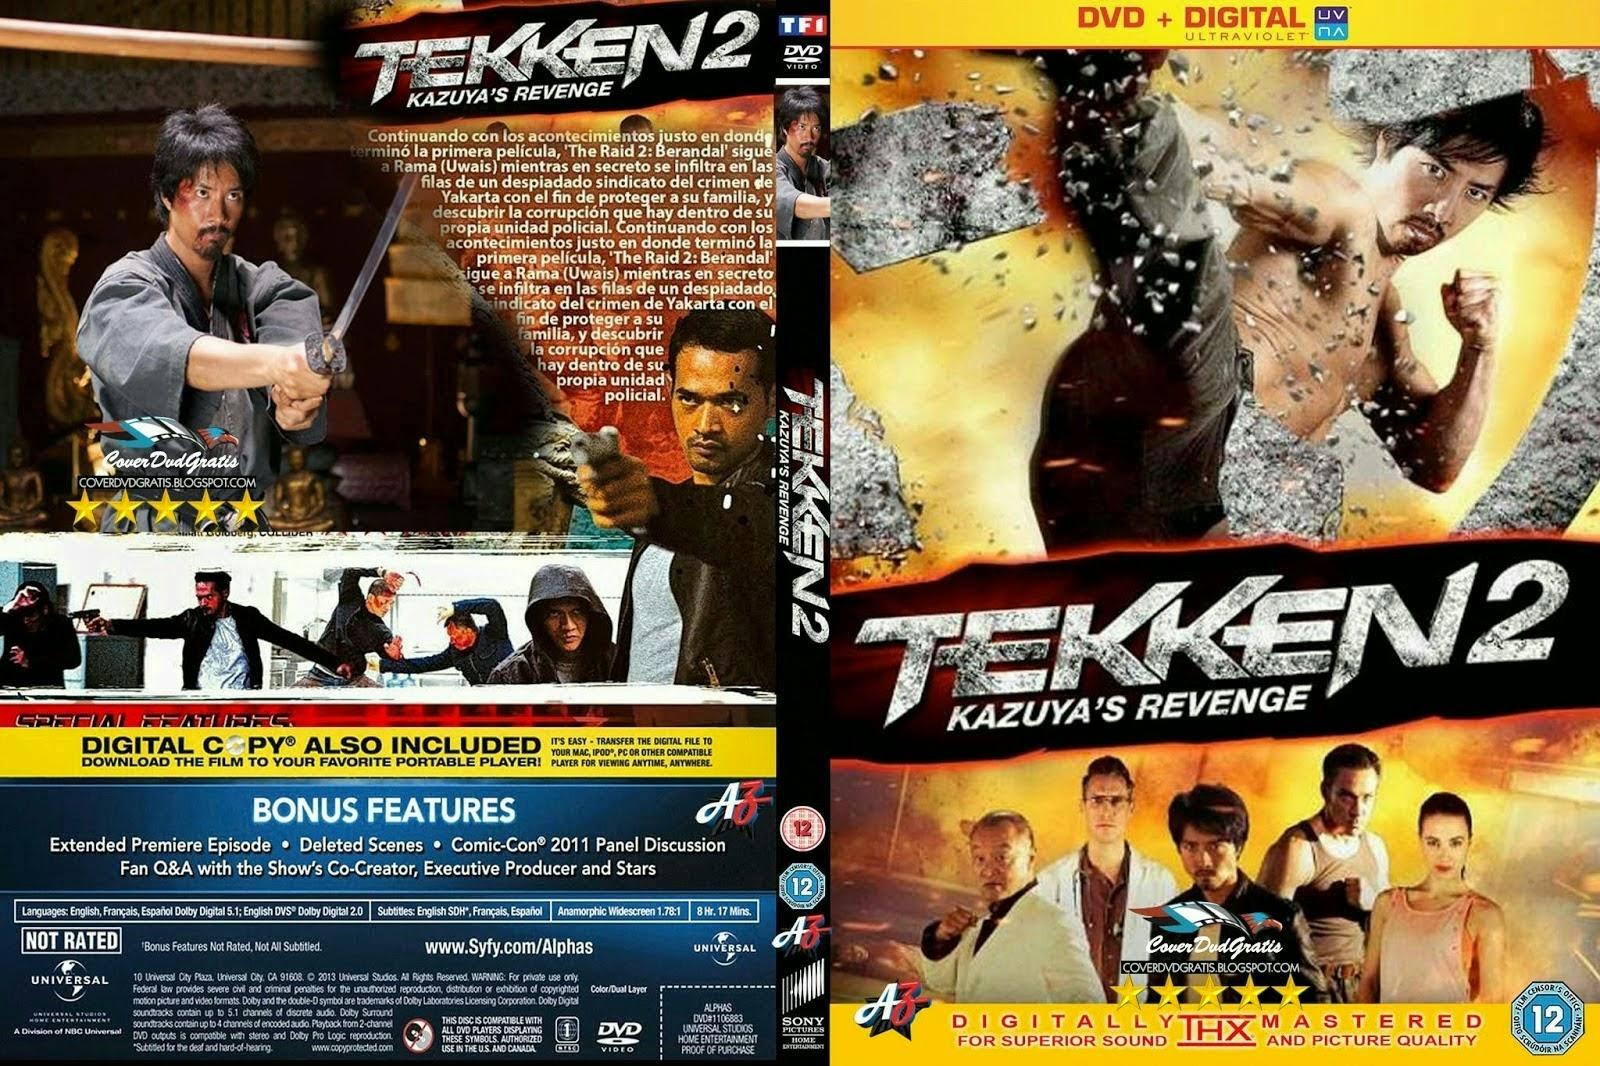 Download Tekken 2 A Vingança De Kazuya BDRip XviD Dual Áudio Tekken 2BRevenge 2BOf 2BKazuya 2B CoveRdvdGratiS